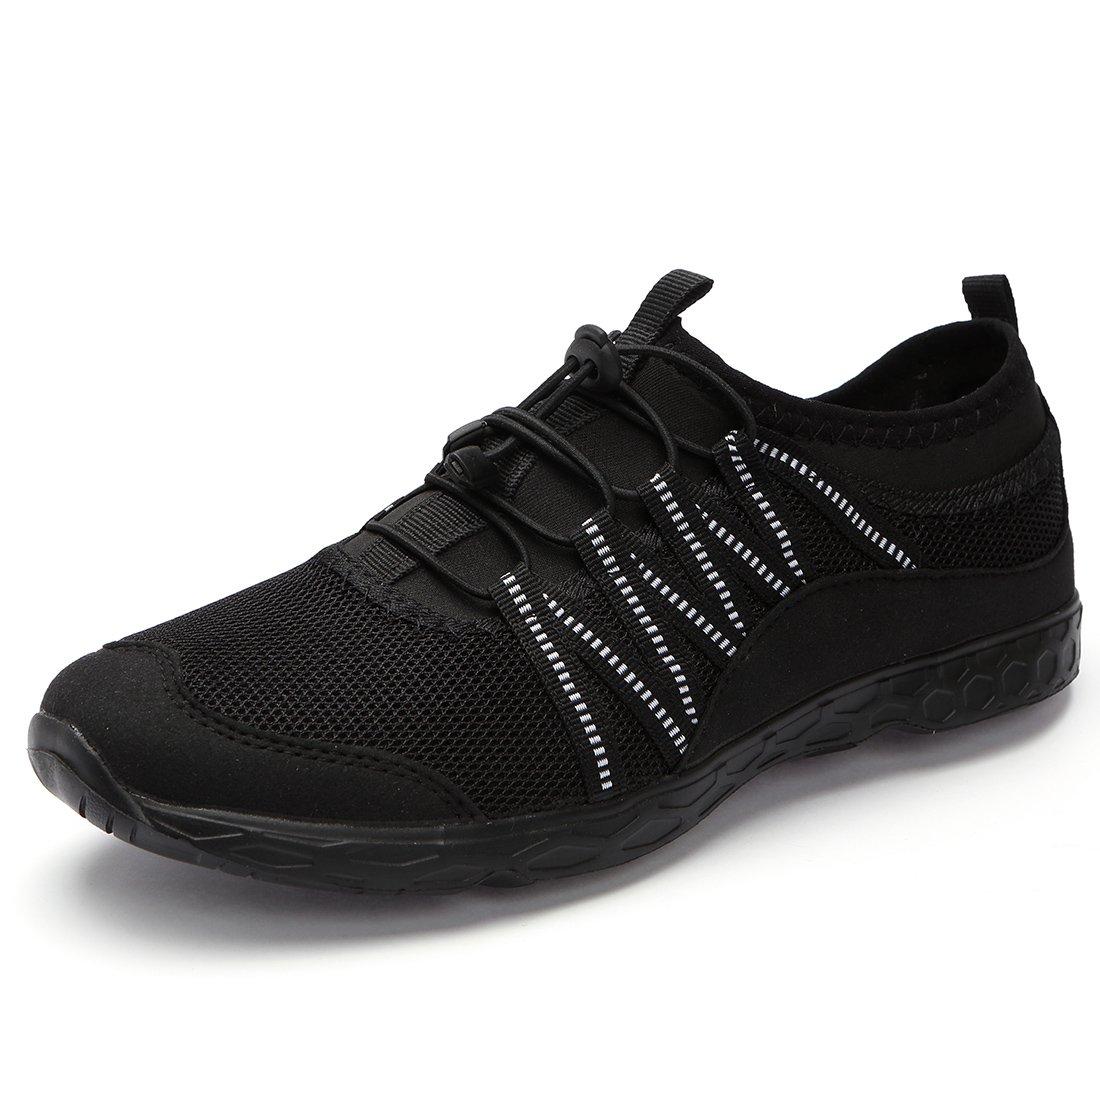 Aqua Water Shoes Men Women-Quick-Dry Lightweight for Summer Water Sports Outdoor Beach Pool Exercise,All Black-073,40 EU-Men 7.0 / Women 8.5 US